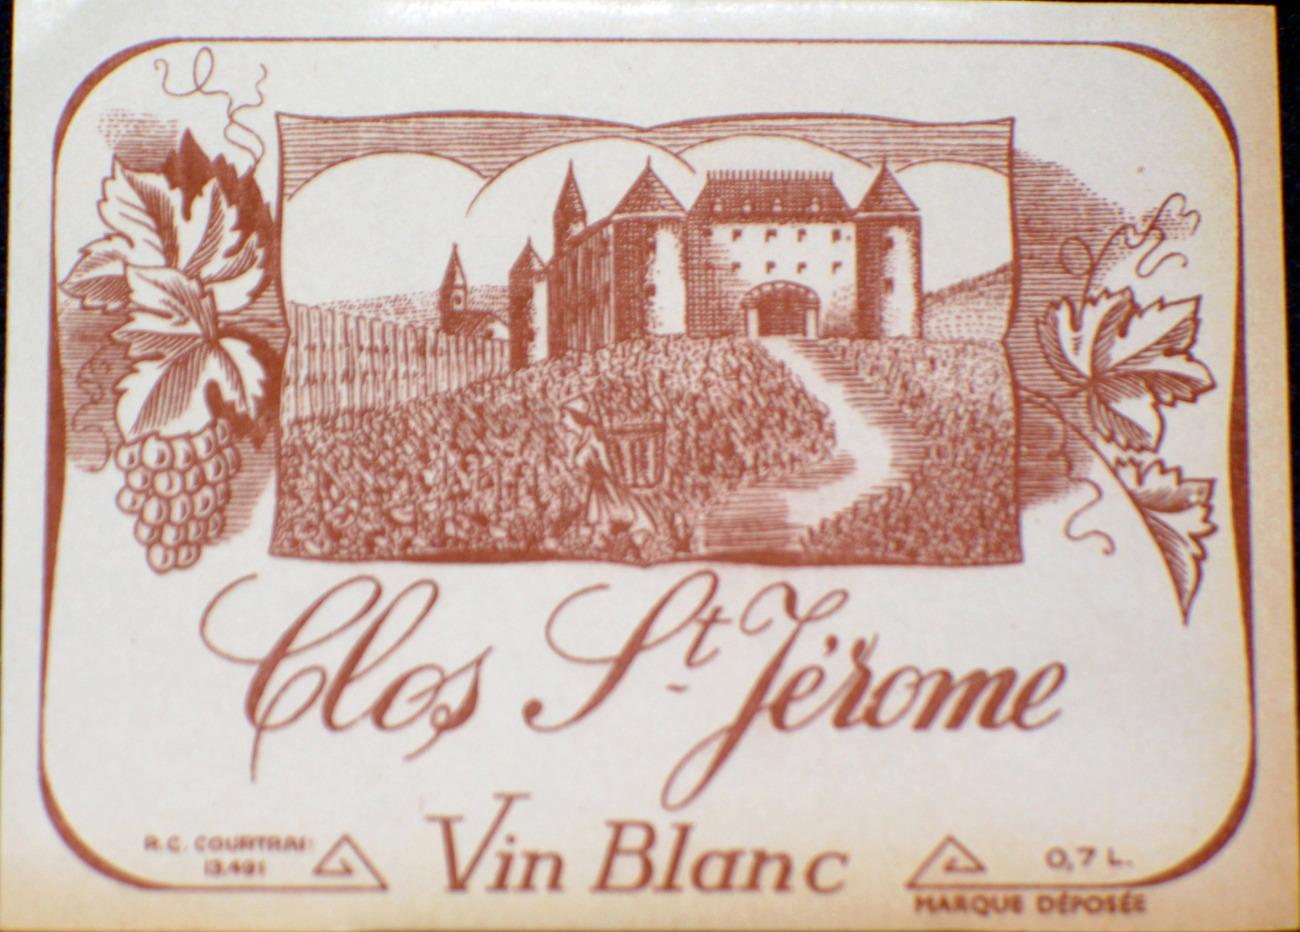 VIN BLANC Clos St. Jerome (White Wine) Label, 1930-50s